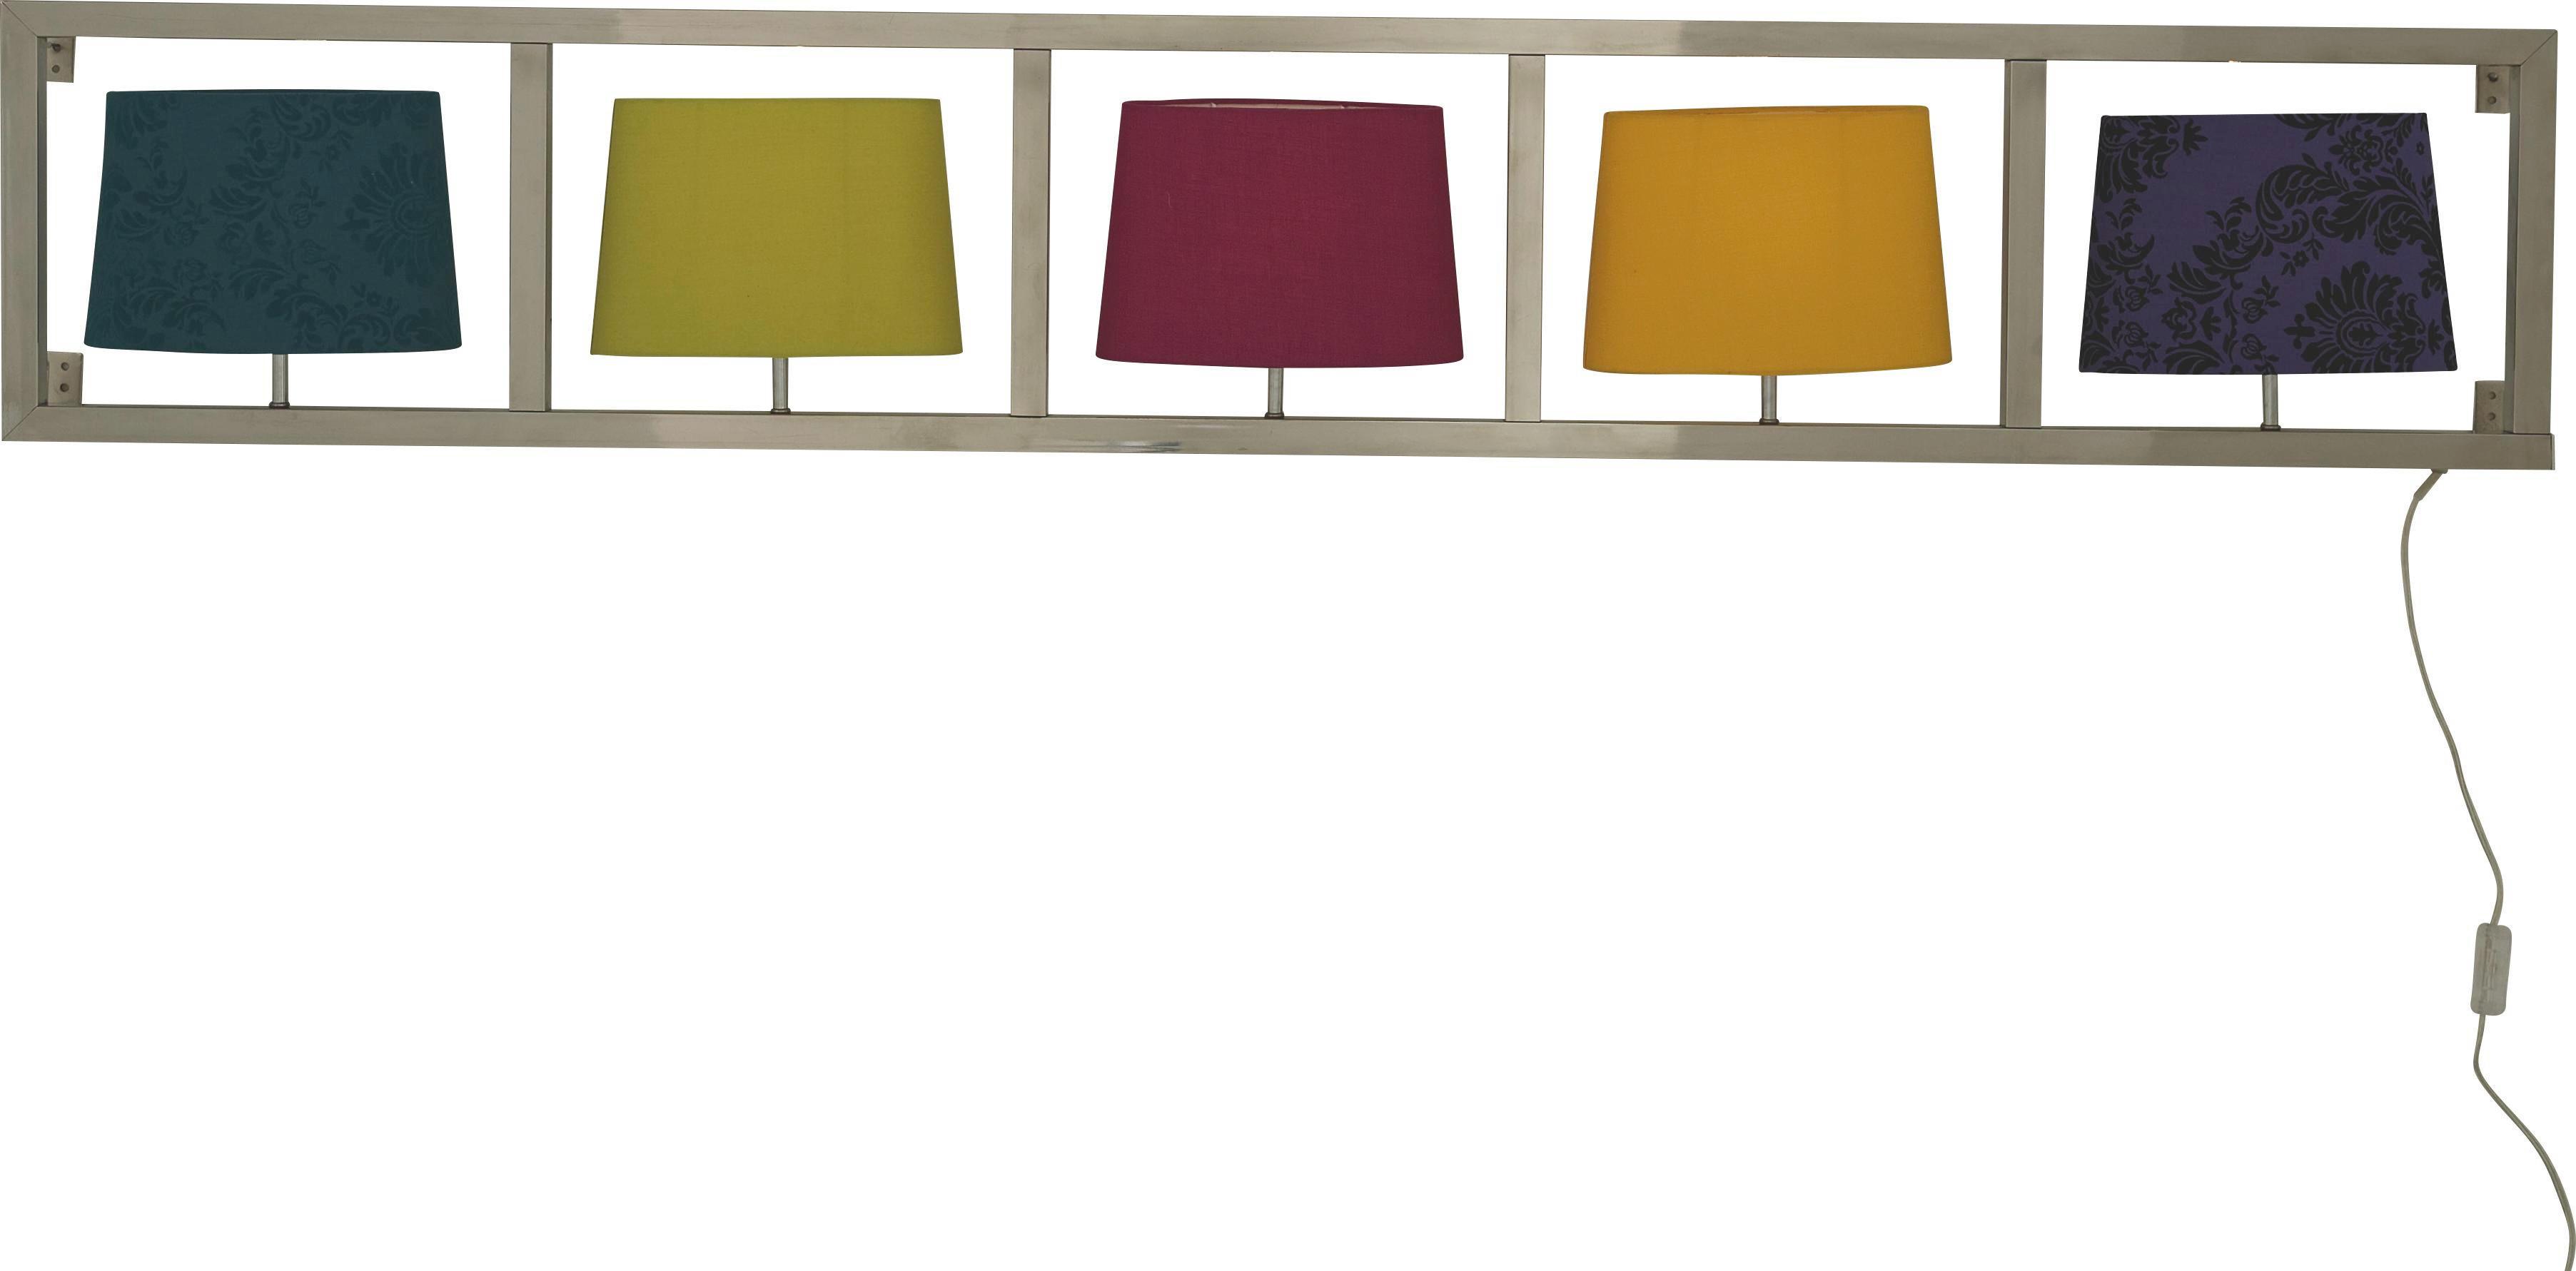 WANDLEUCHTE - Multicolor, Design, Textil/Metall (173/30/16.2cm) - KARE-Design